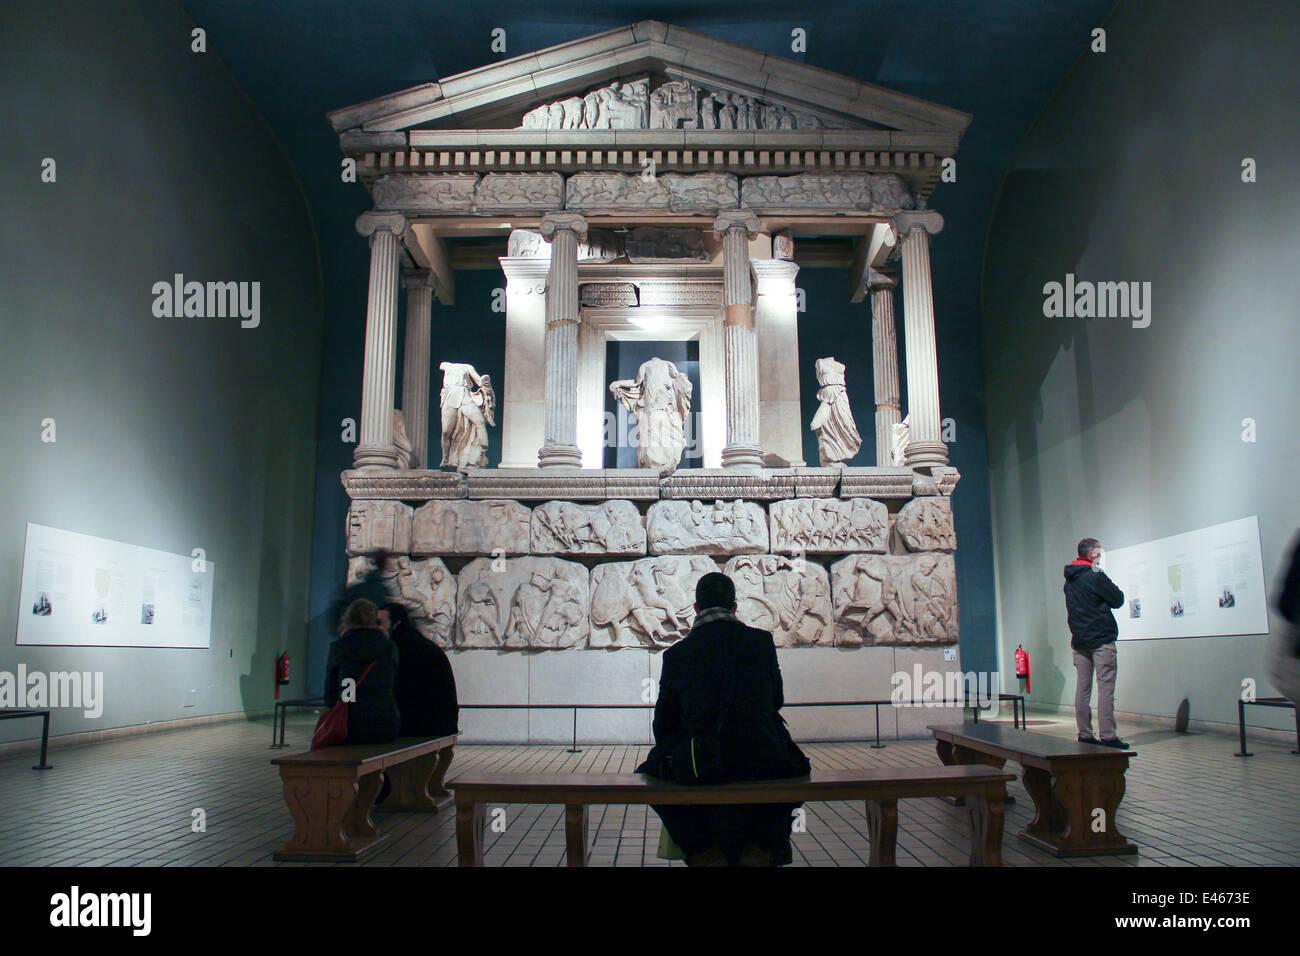 London: Nereid Monument at the British Museum . Photo from 09 January 2014. Stock Photo